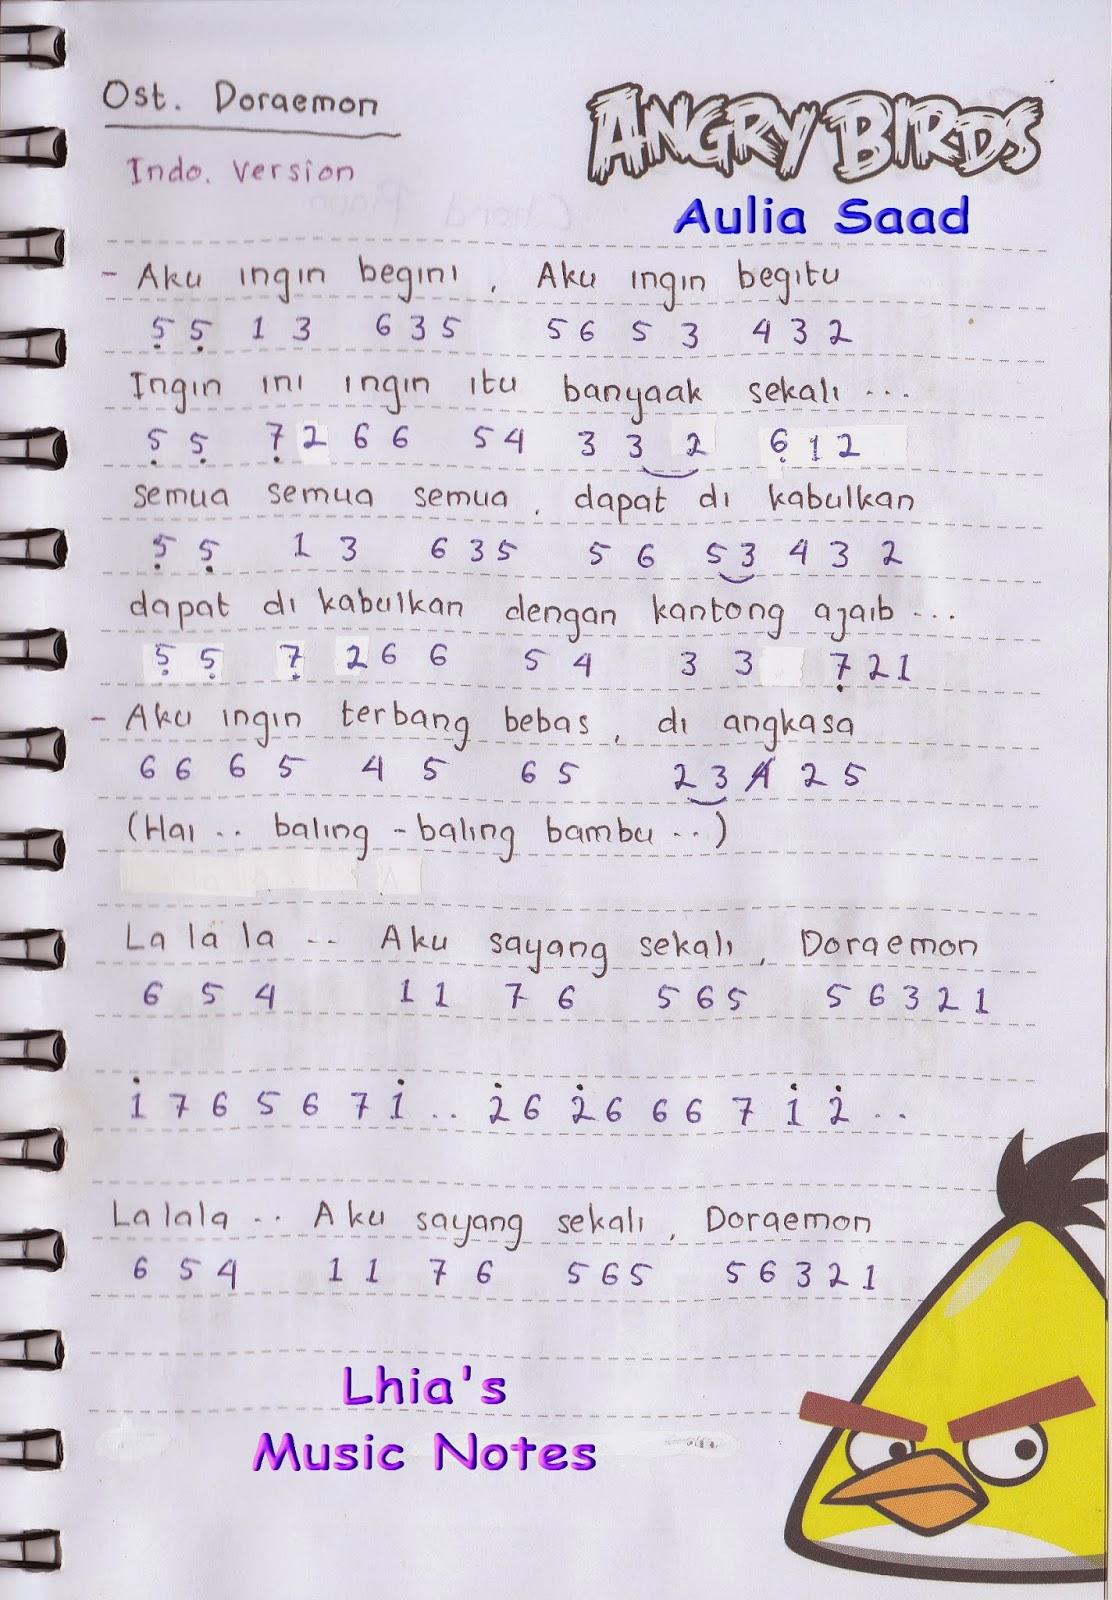 , Ost. Doraemon (Opening, Indonesia) Not Angka Lagu Akulah Serigala